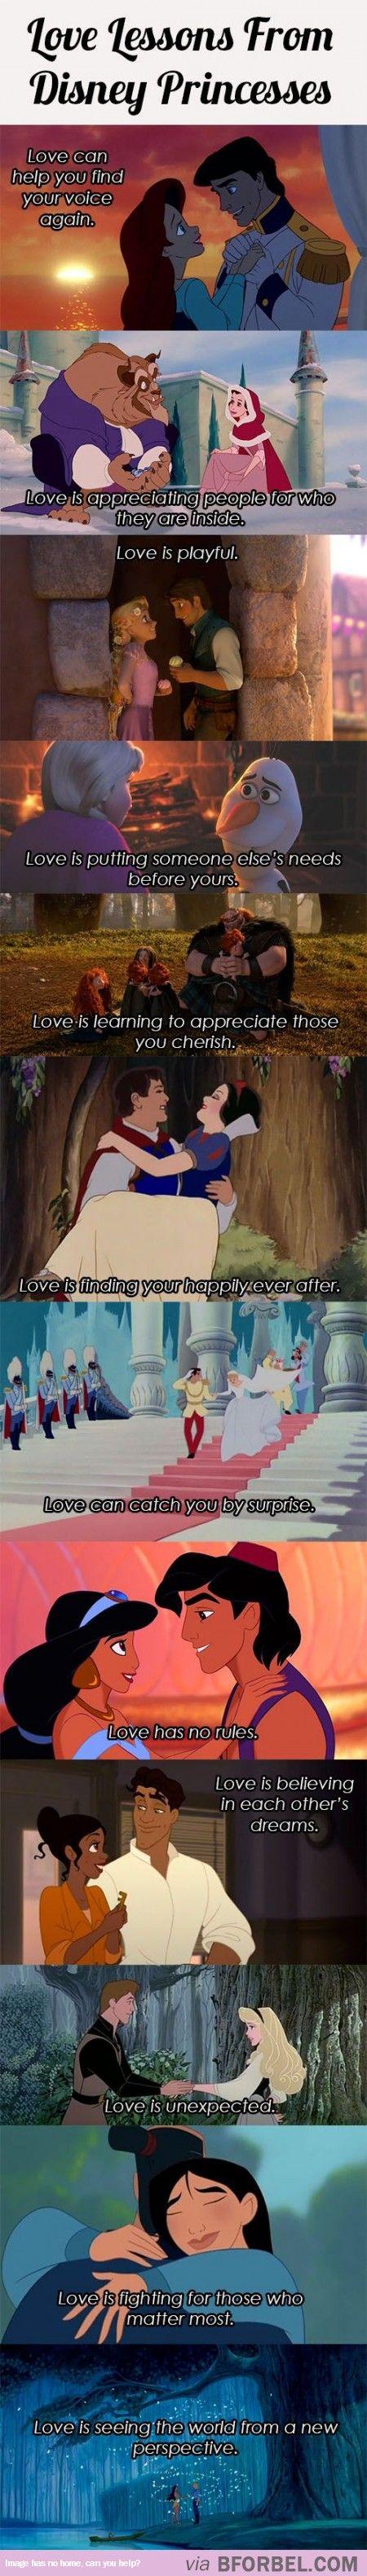 12 Love Lessons That Disney Princesses Taught Us Disney Pixar Disney Quotes Disney Princess Quotes